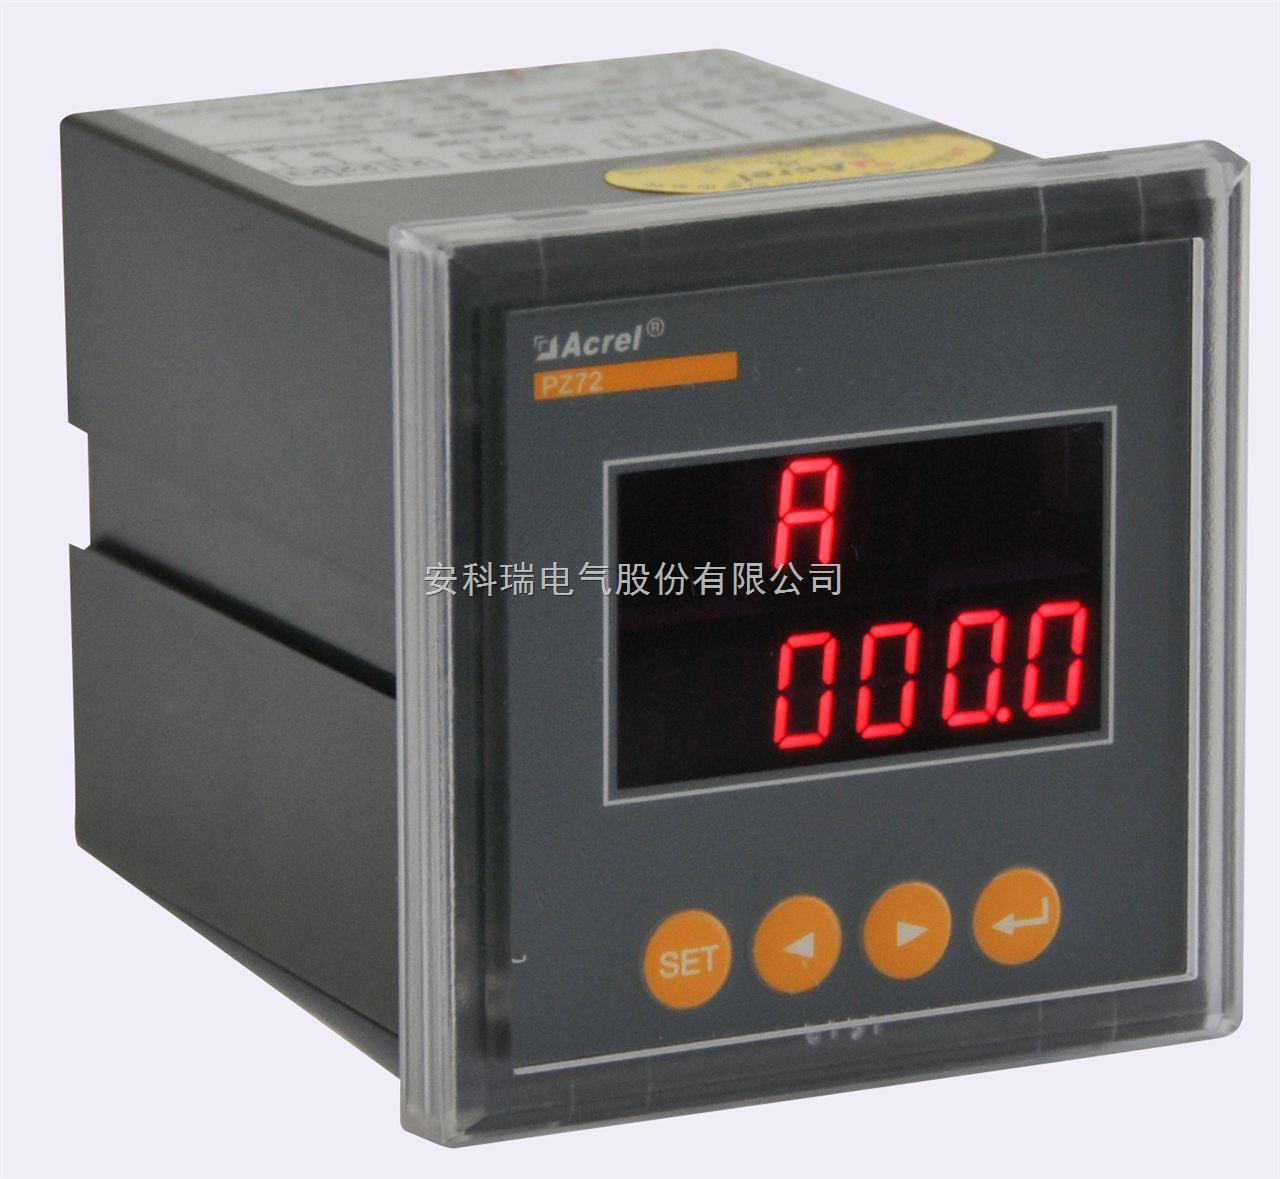 安科瑞直流电流表P72-DI P96B-DI价格